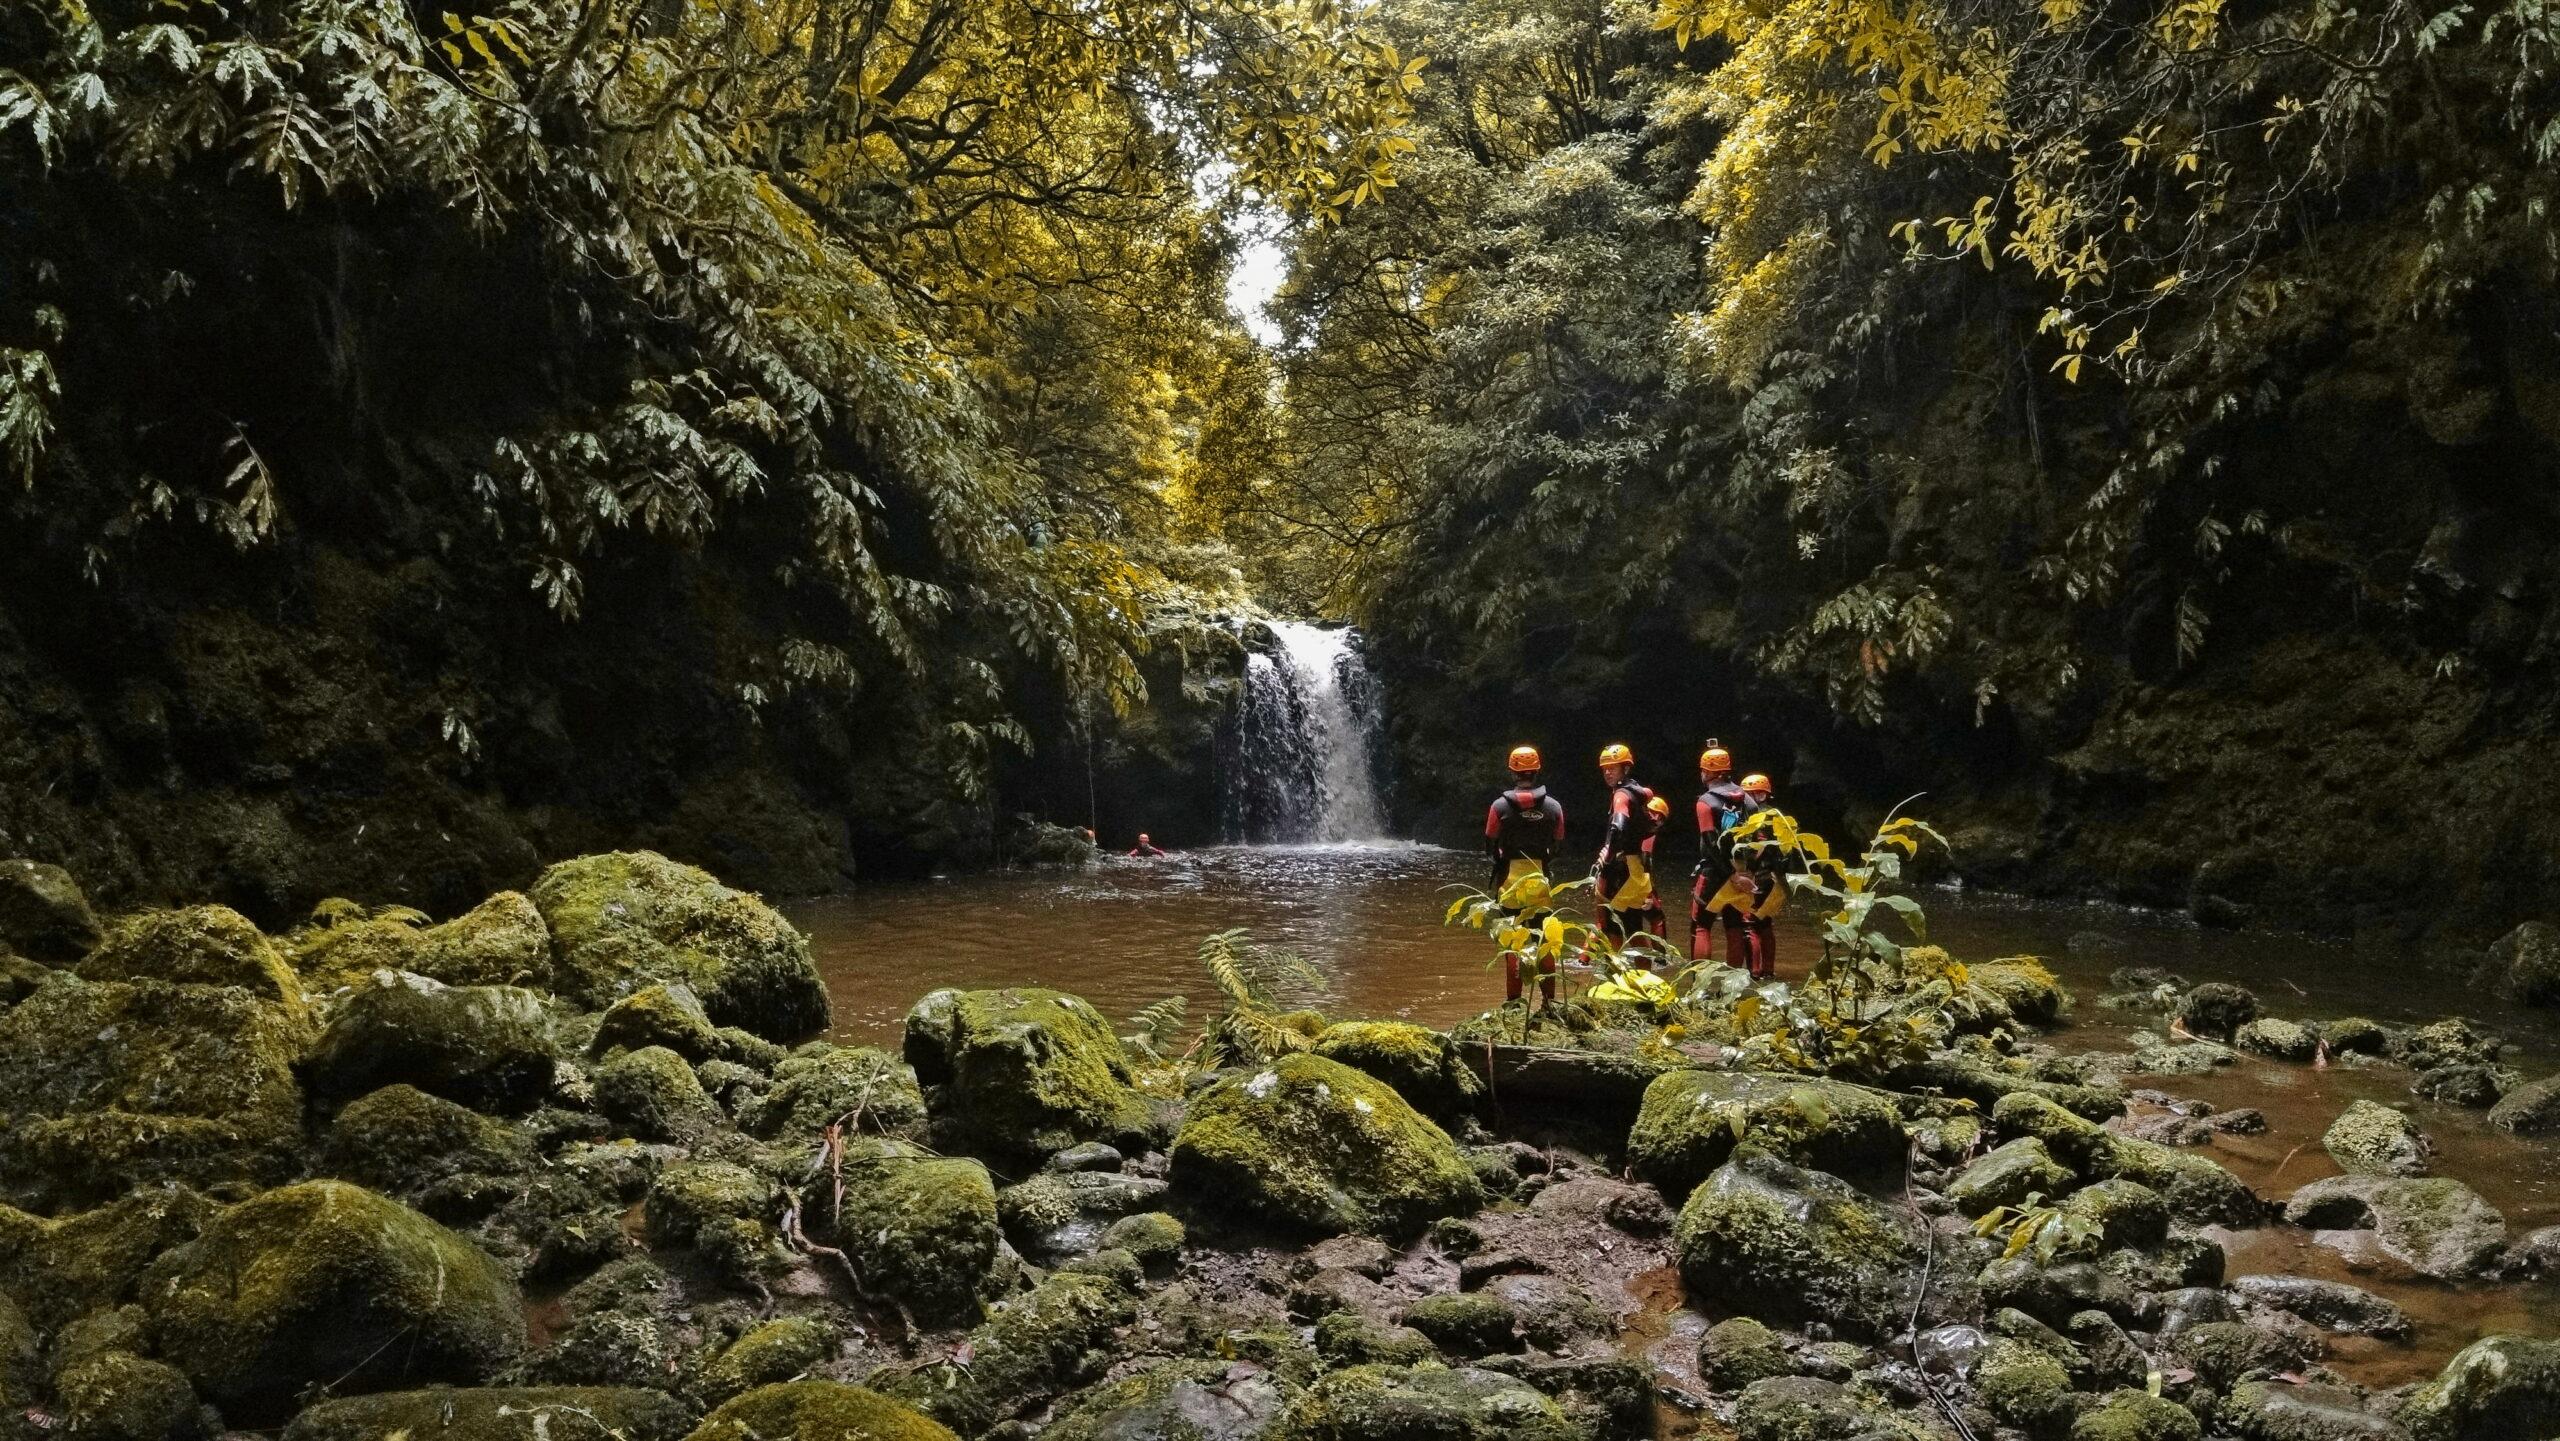 Ribeira Da Salga Canyoning Tour From Ponta Delgada_108.jpg